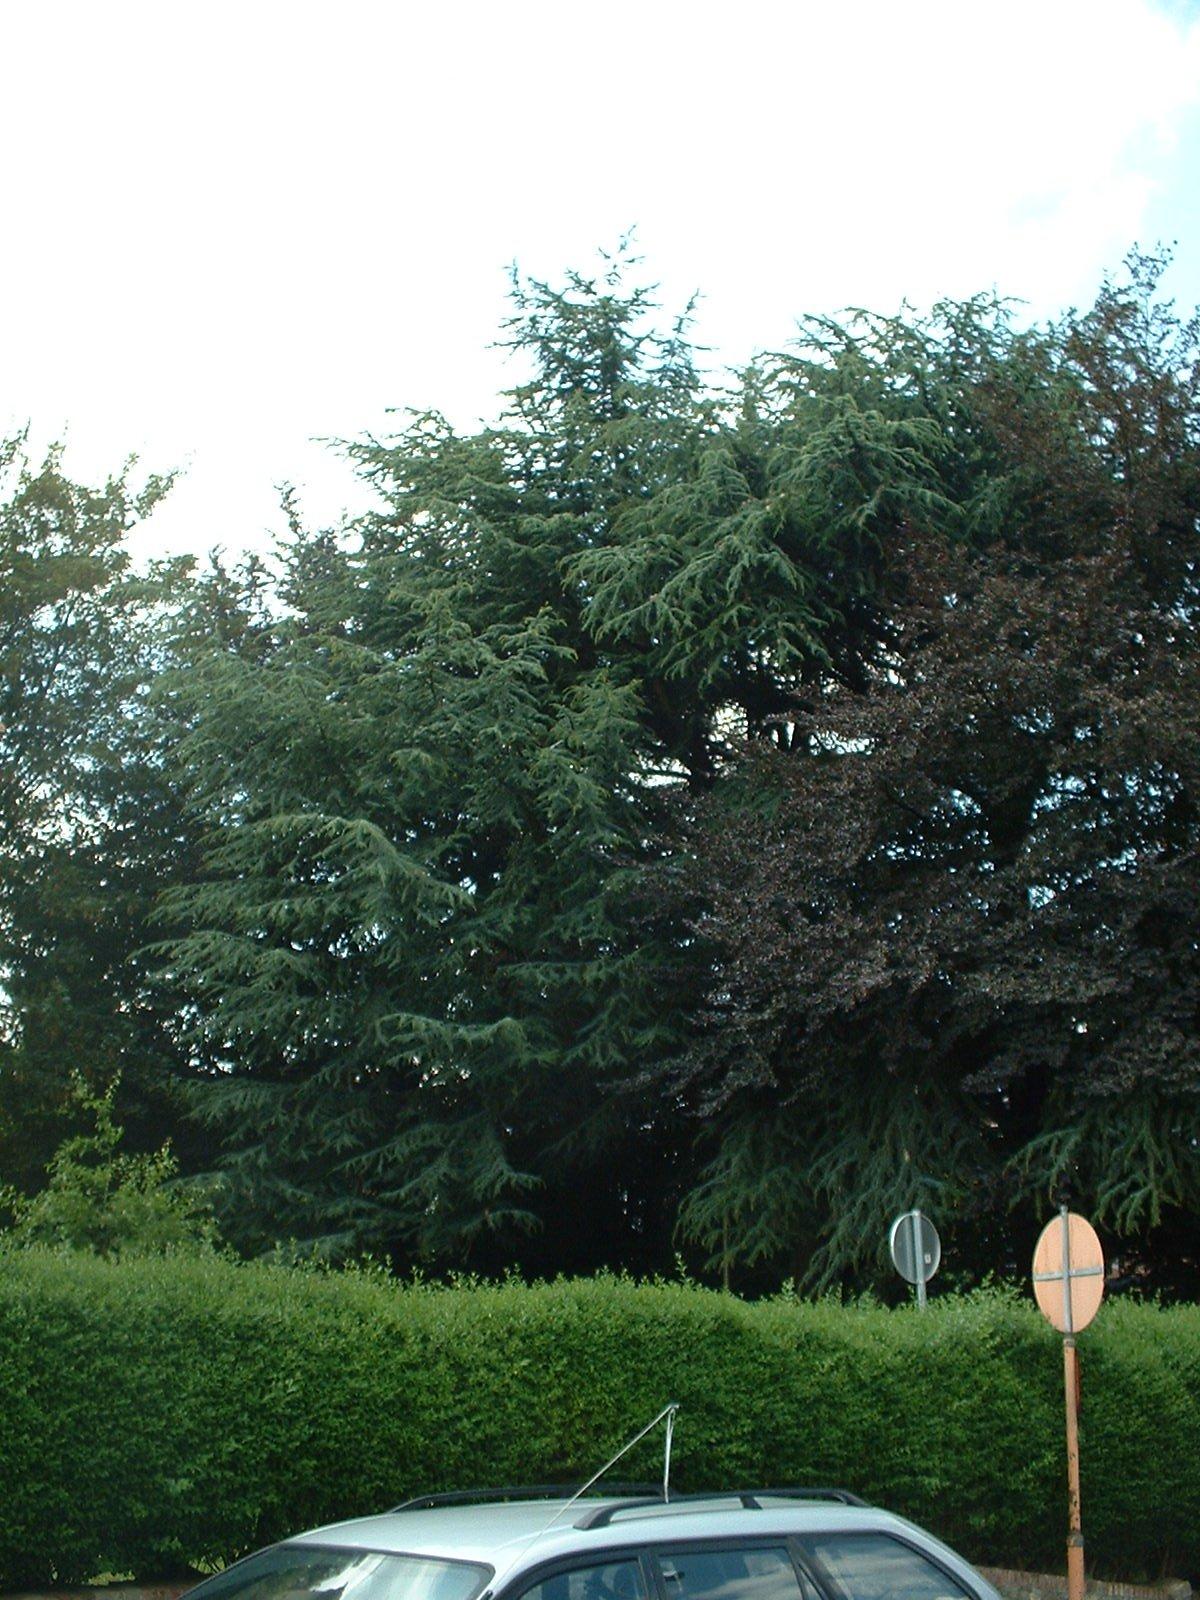 Cèdre bleu de l'Atlas – Molenbeek-Saint-Jean, Chaussée de Ninove, 1110 –  06 Juillet 2004